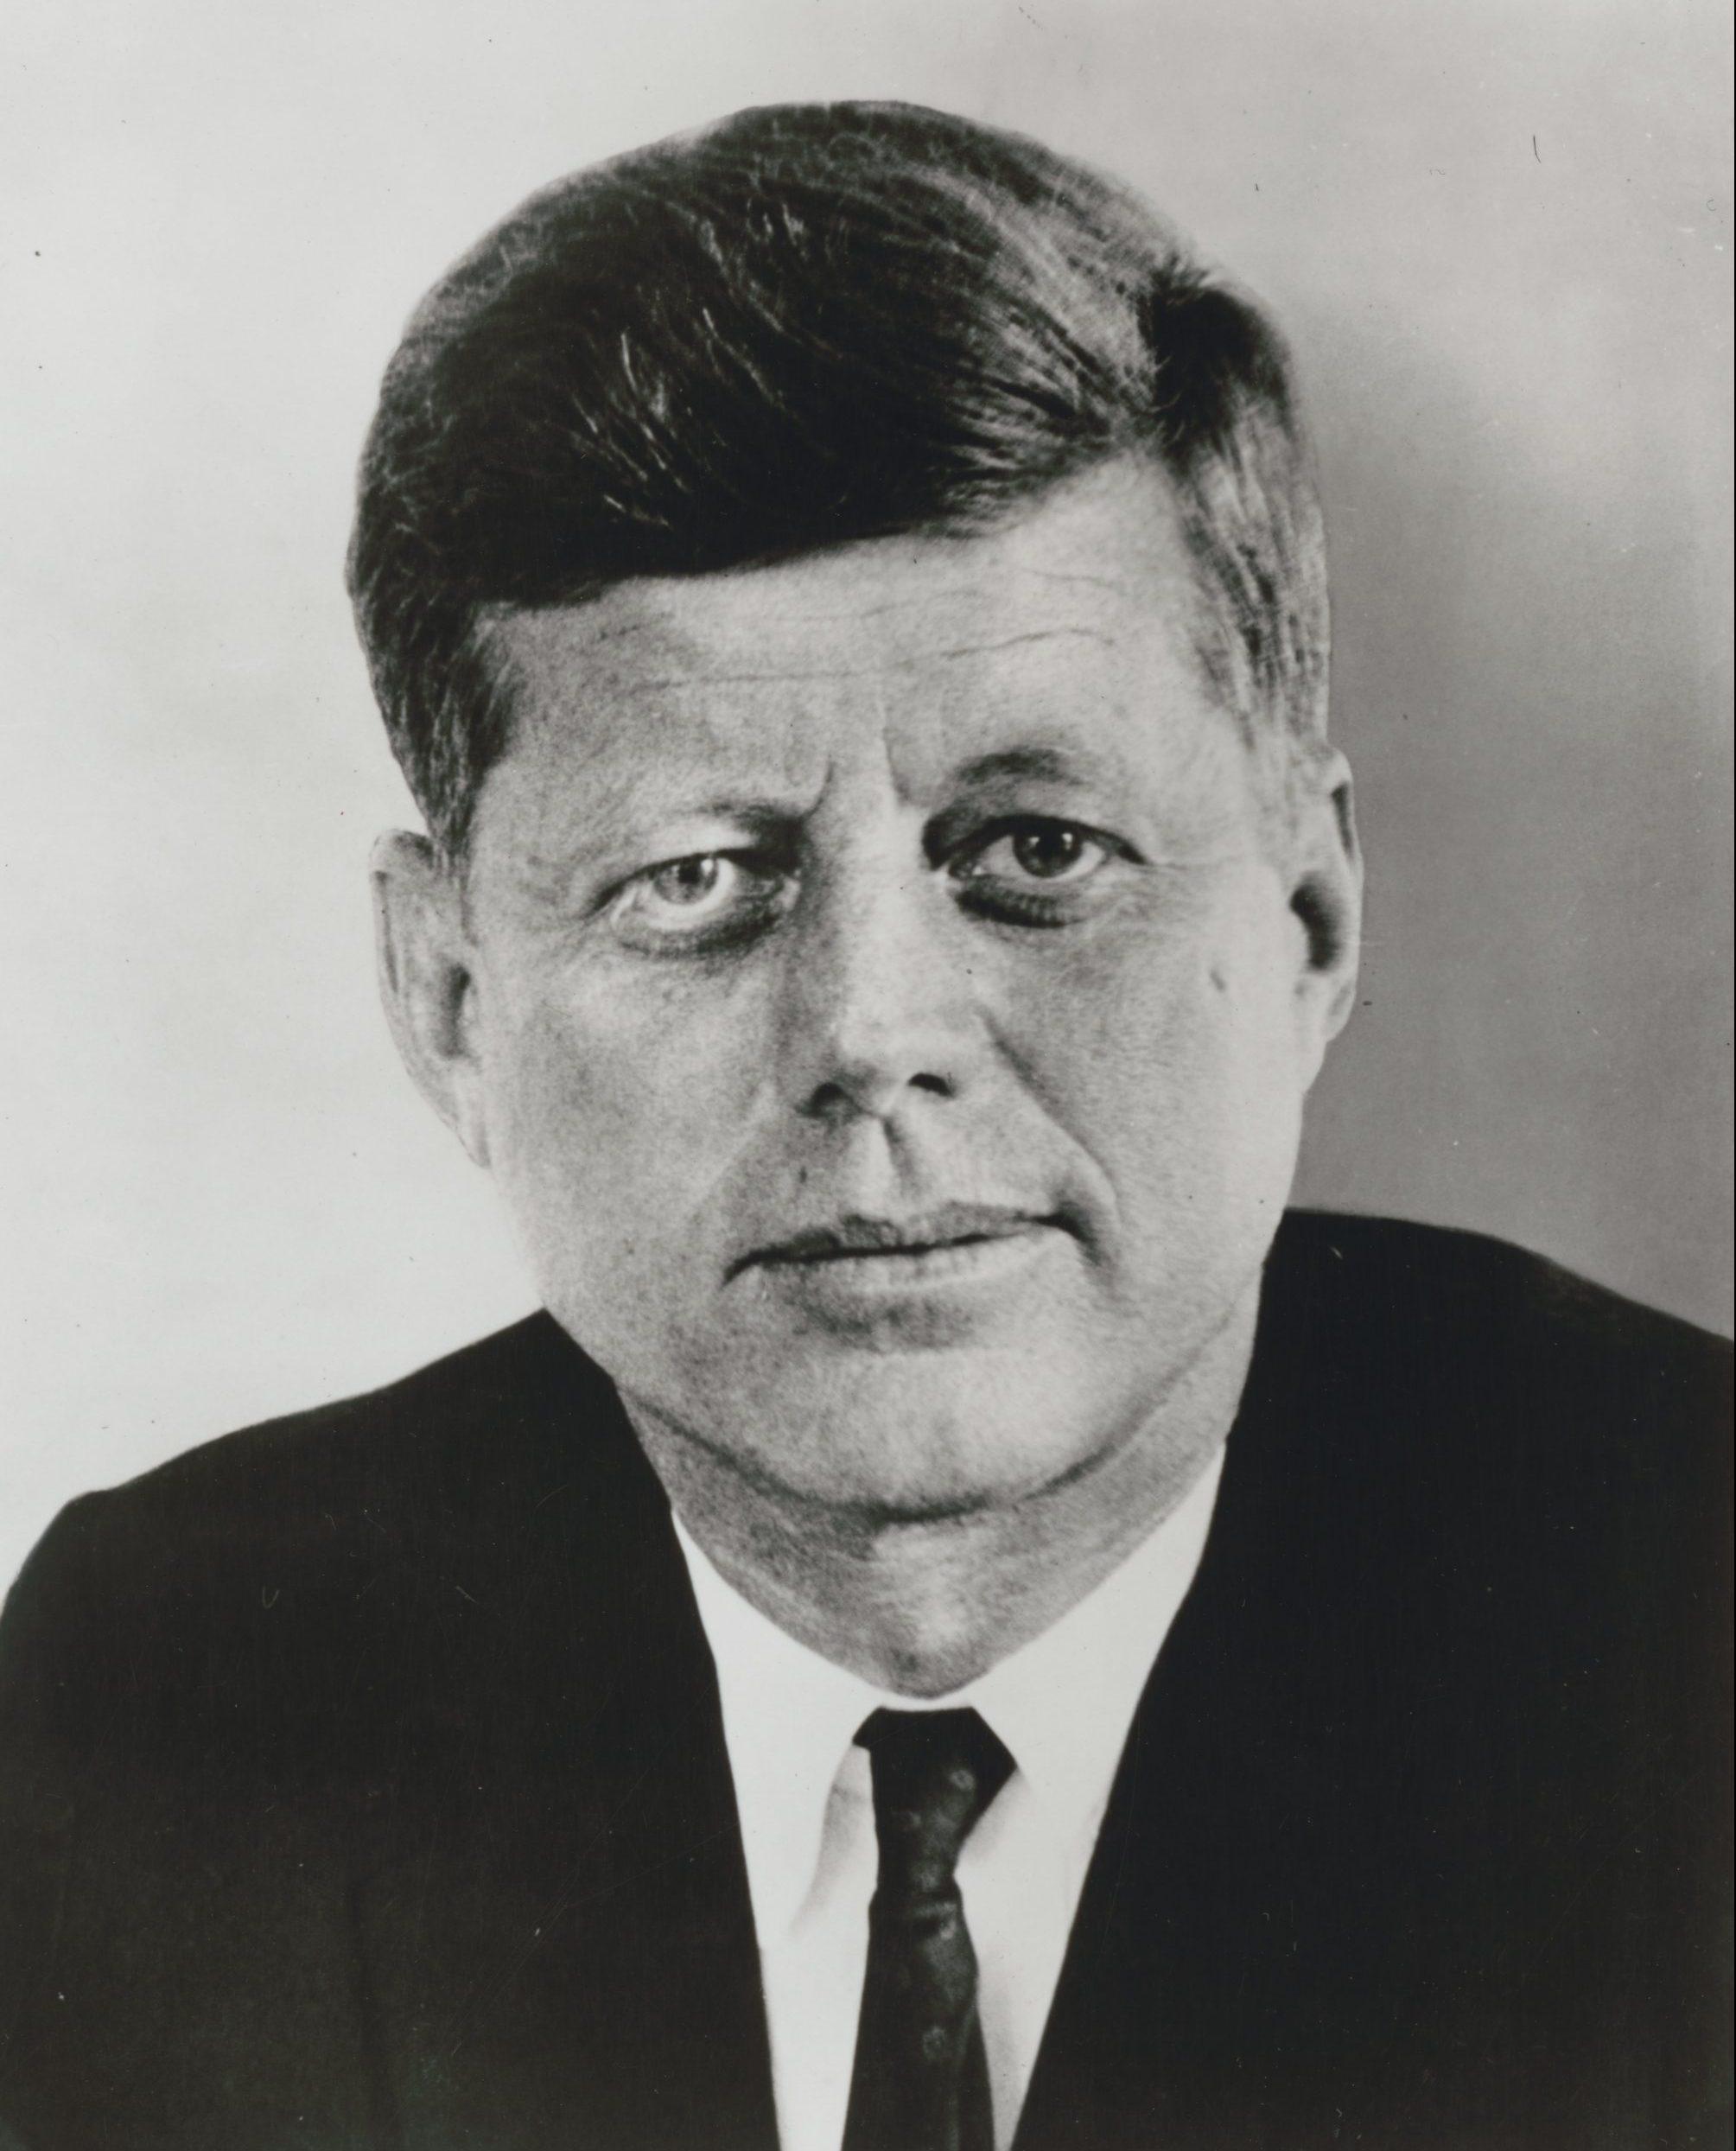 black and white photo of John F. Kennedy